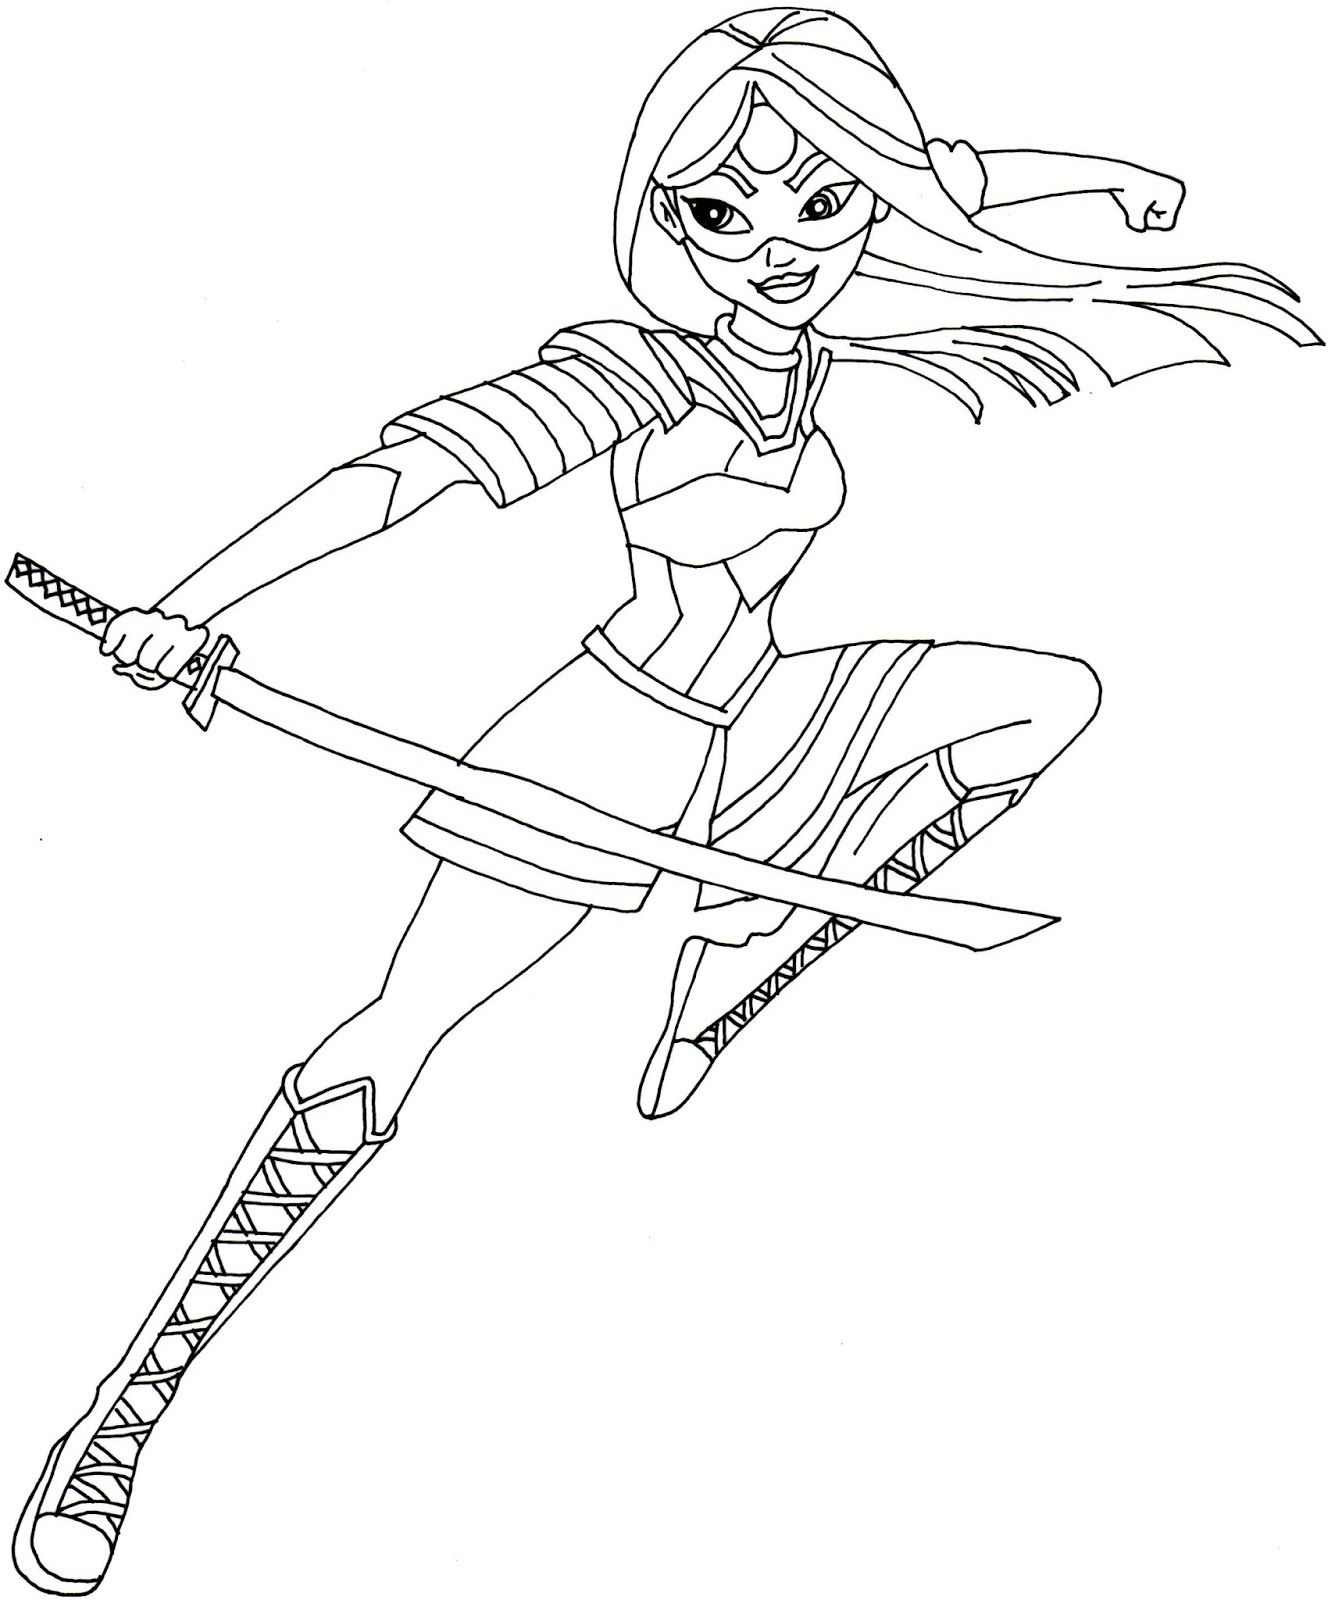 Free Printable Super Hero High Coloring Page For Katana